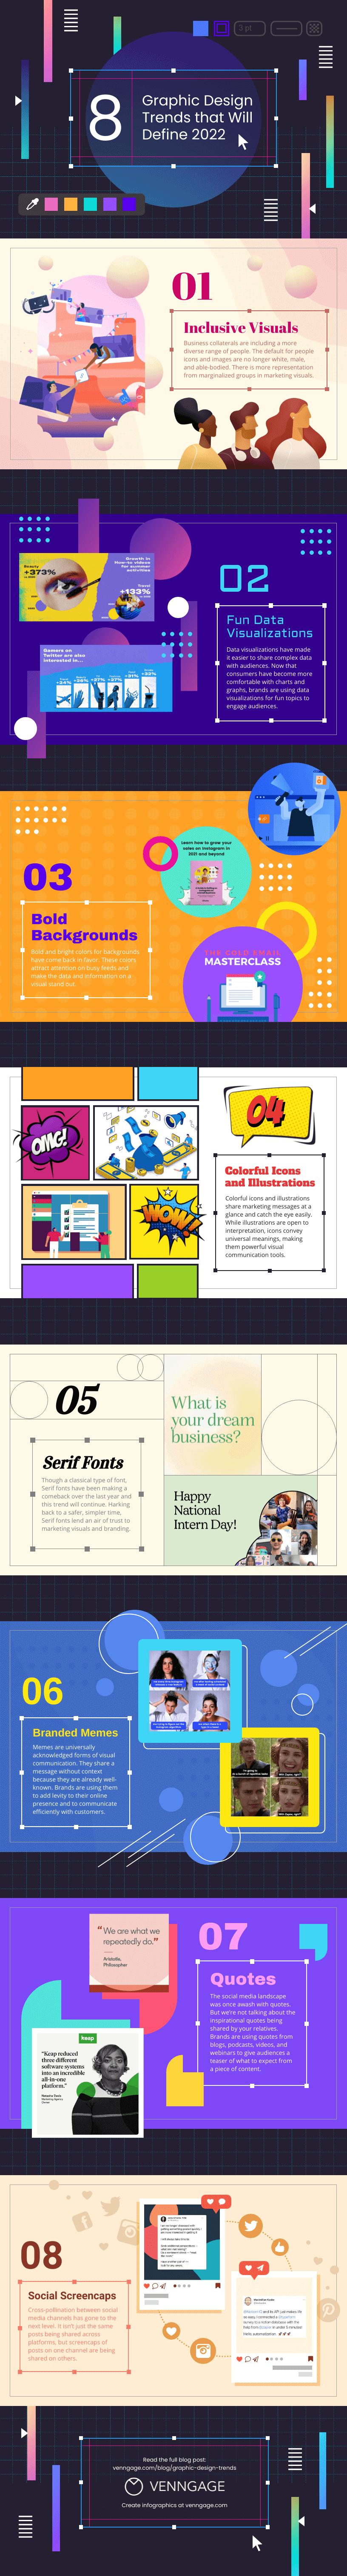 Graphic_Design_Trends_2022_Infographic